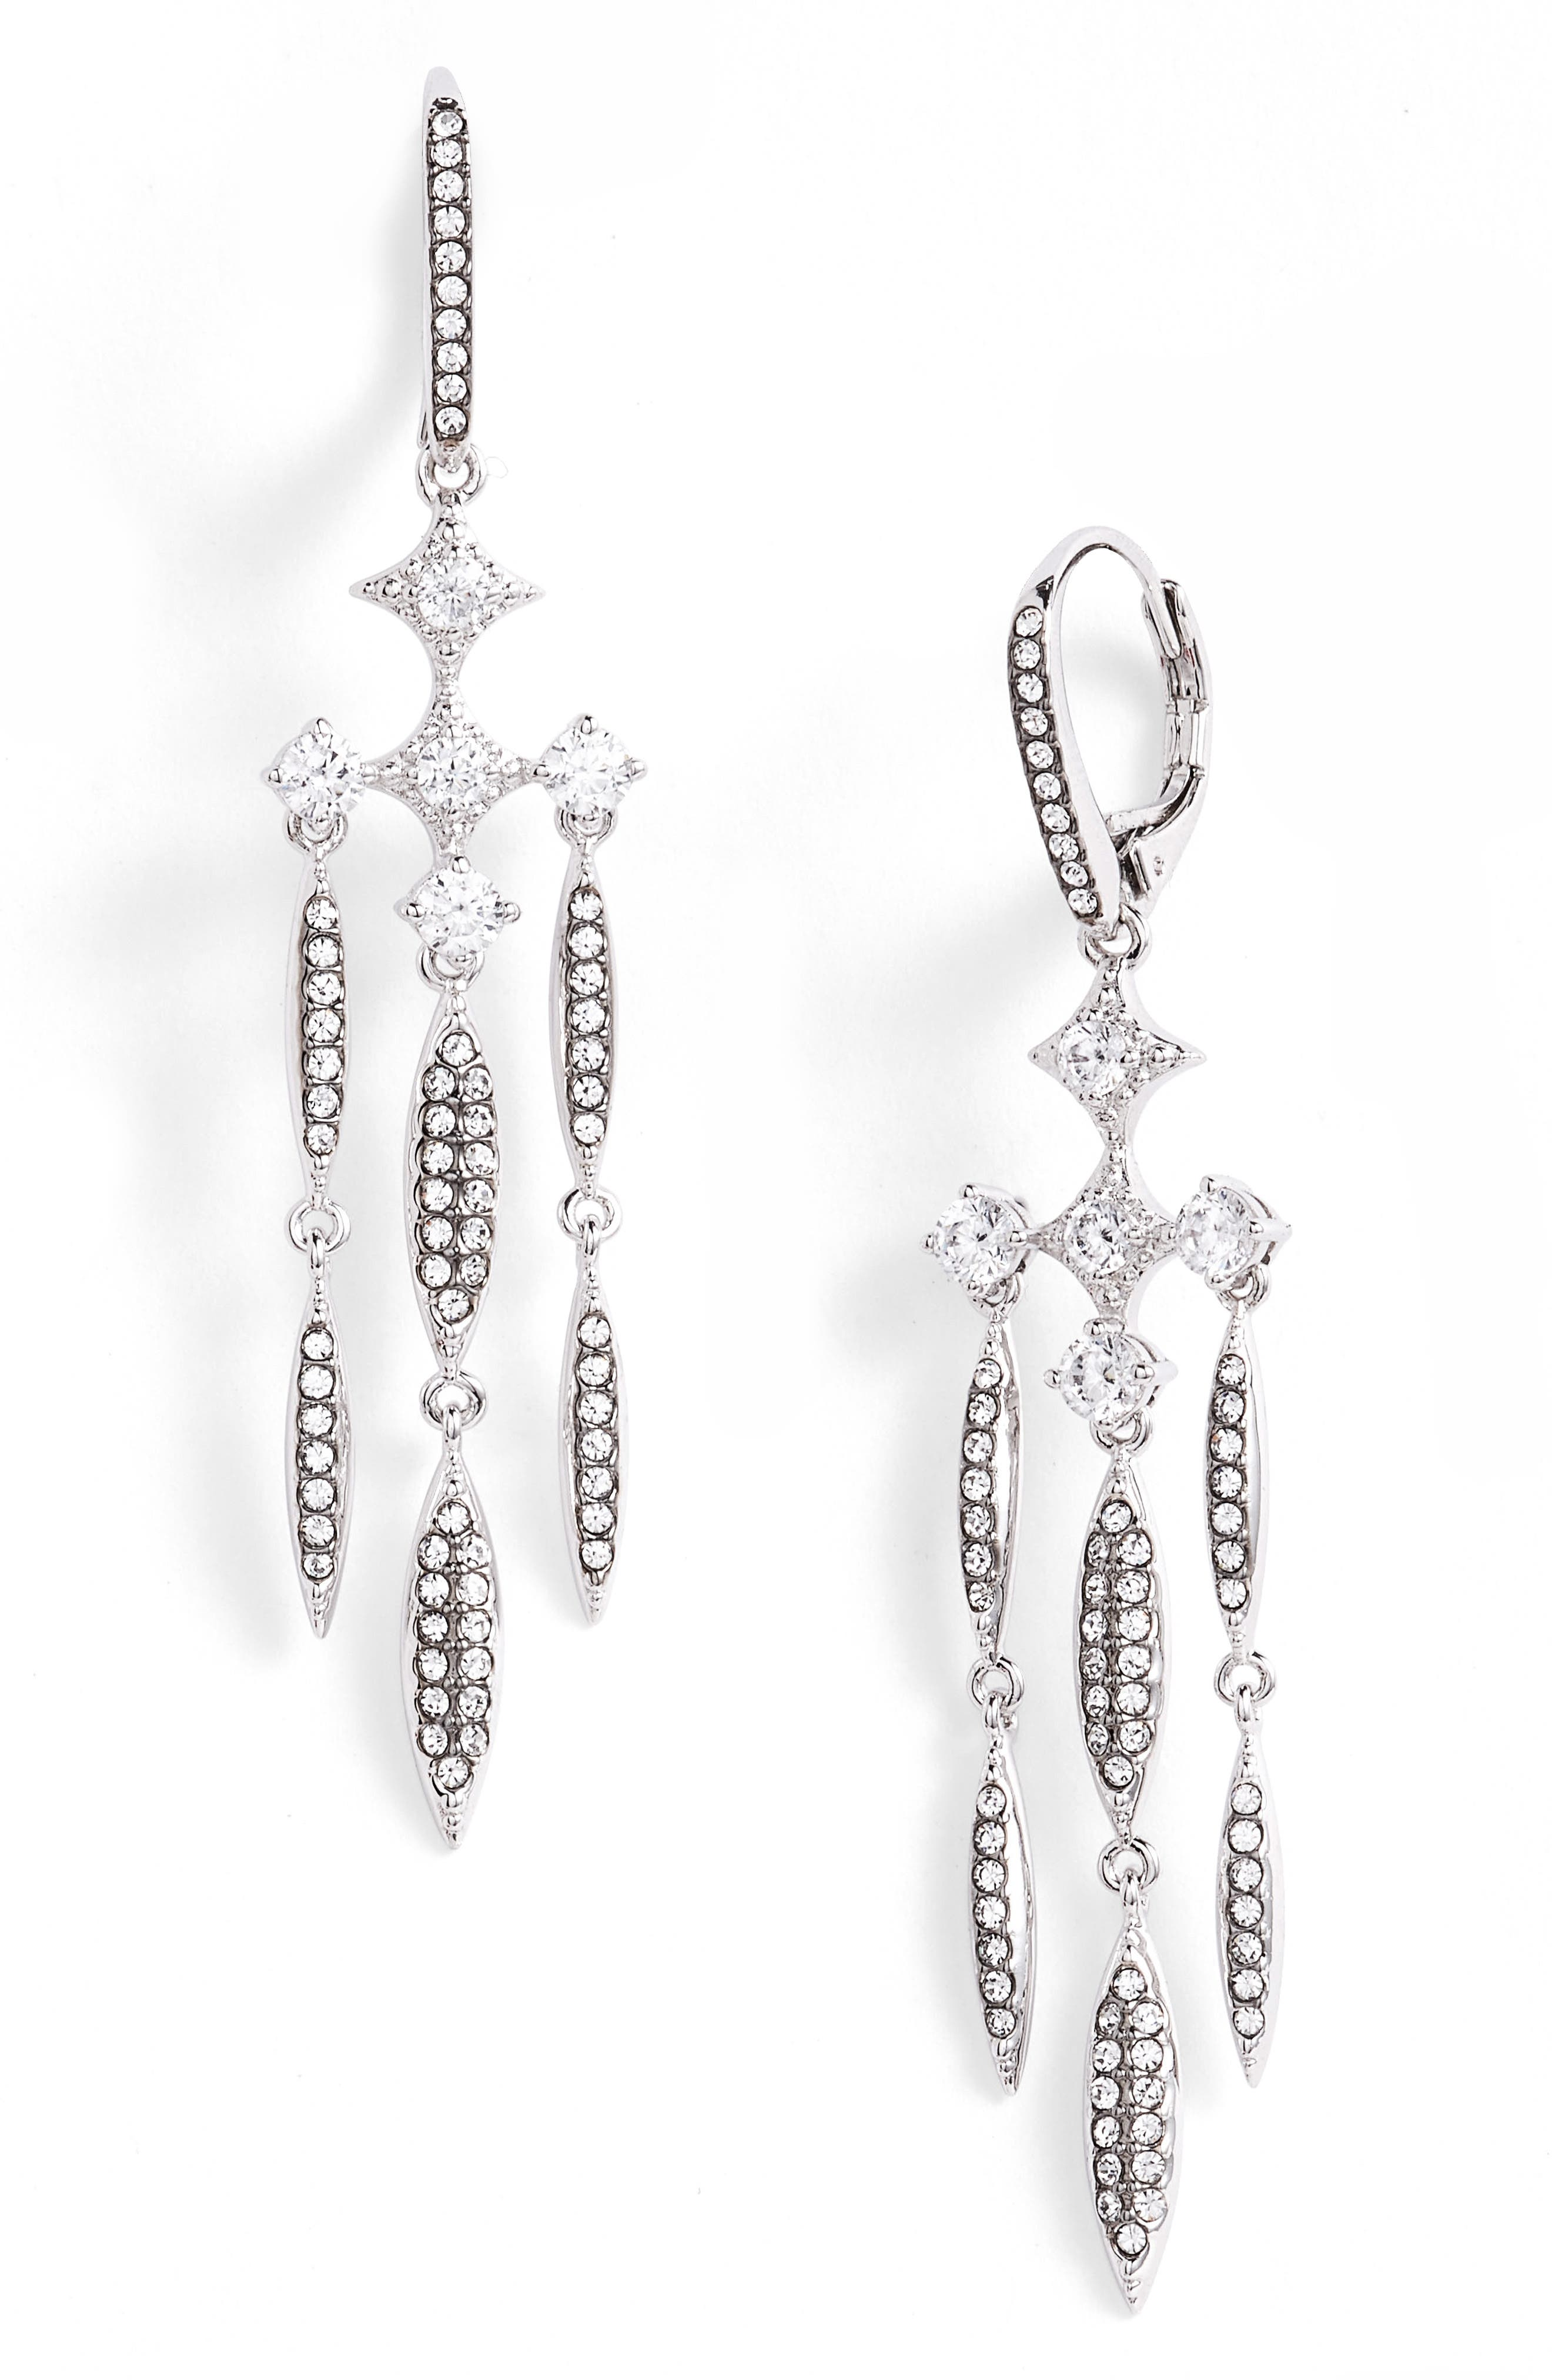 Cardamom Chandelier Earrings,                             Main thumbnail 1, color,                             Black / Silver